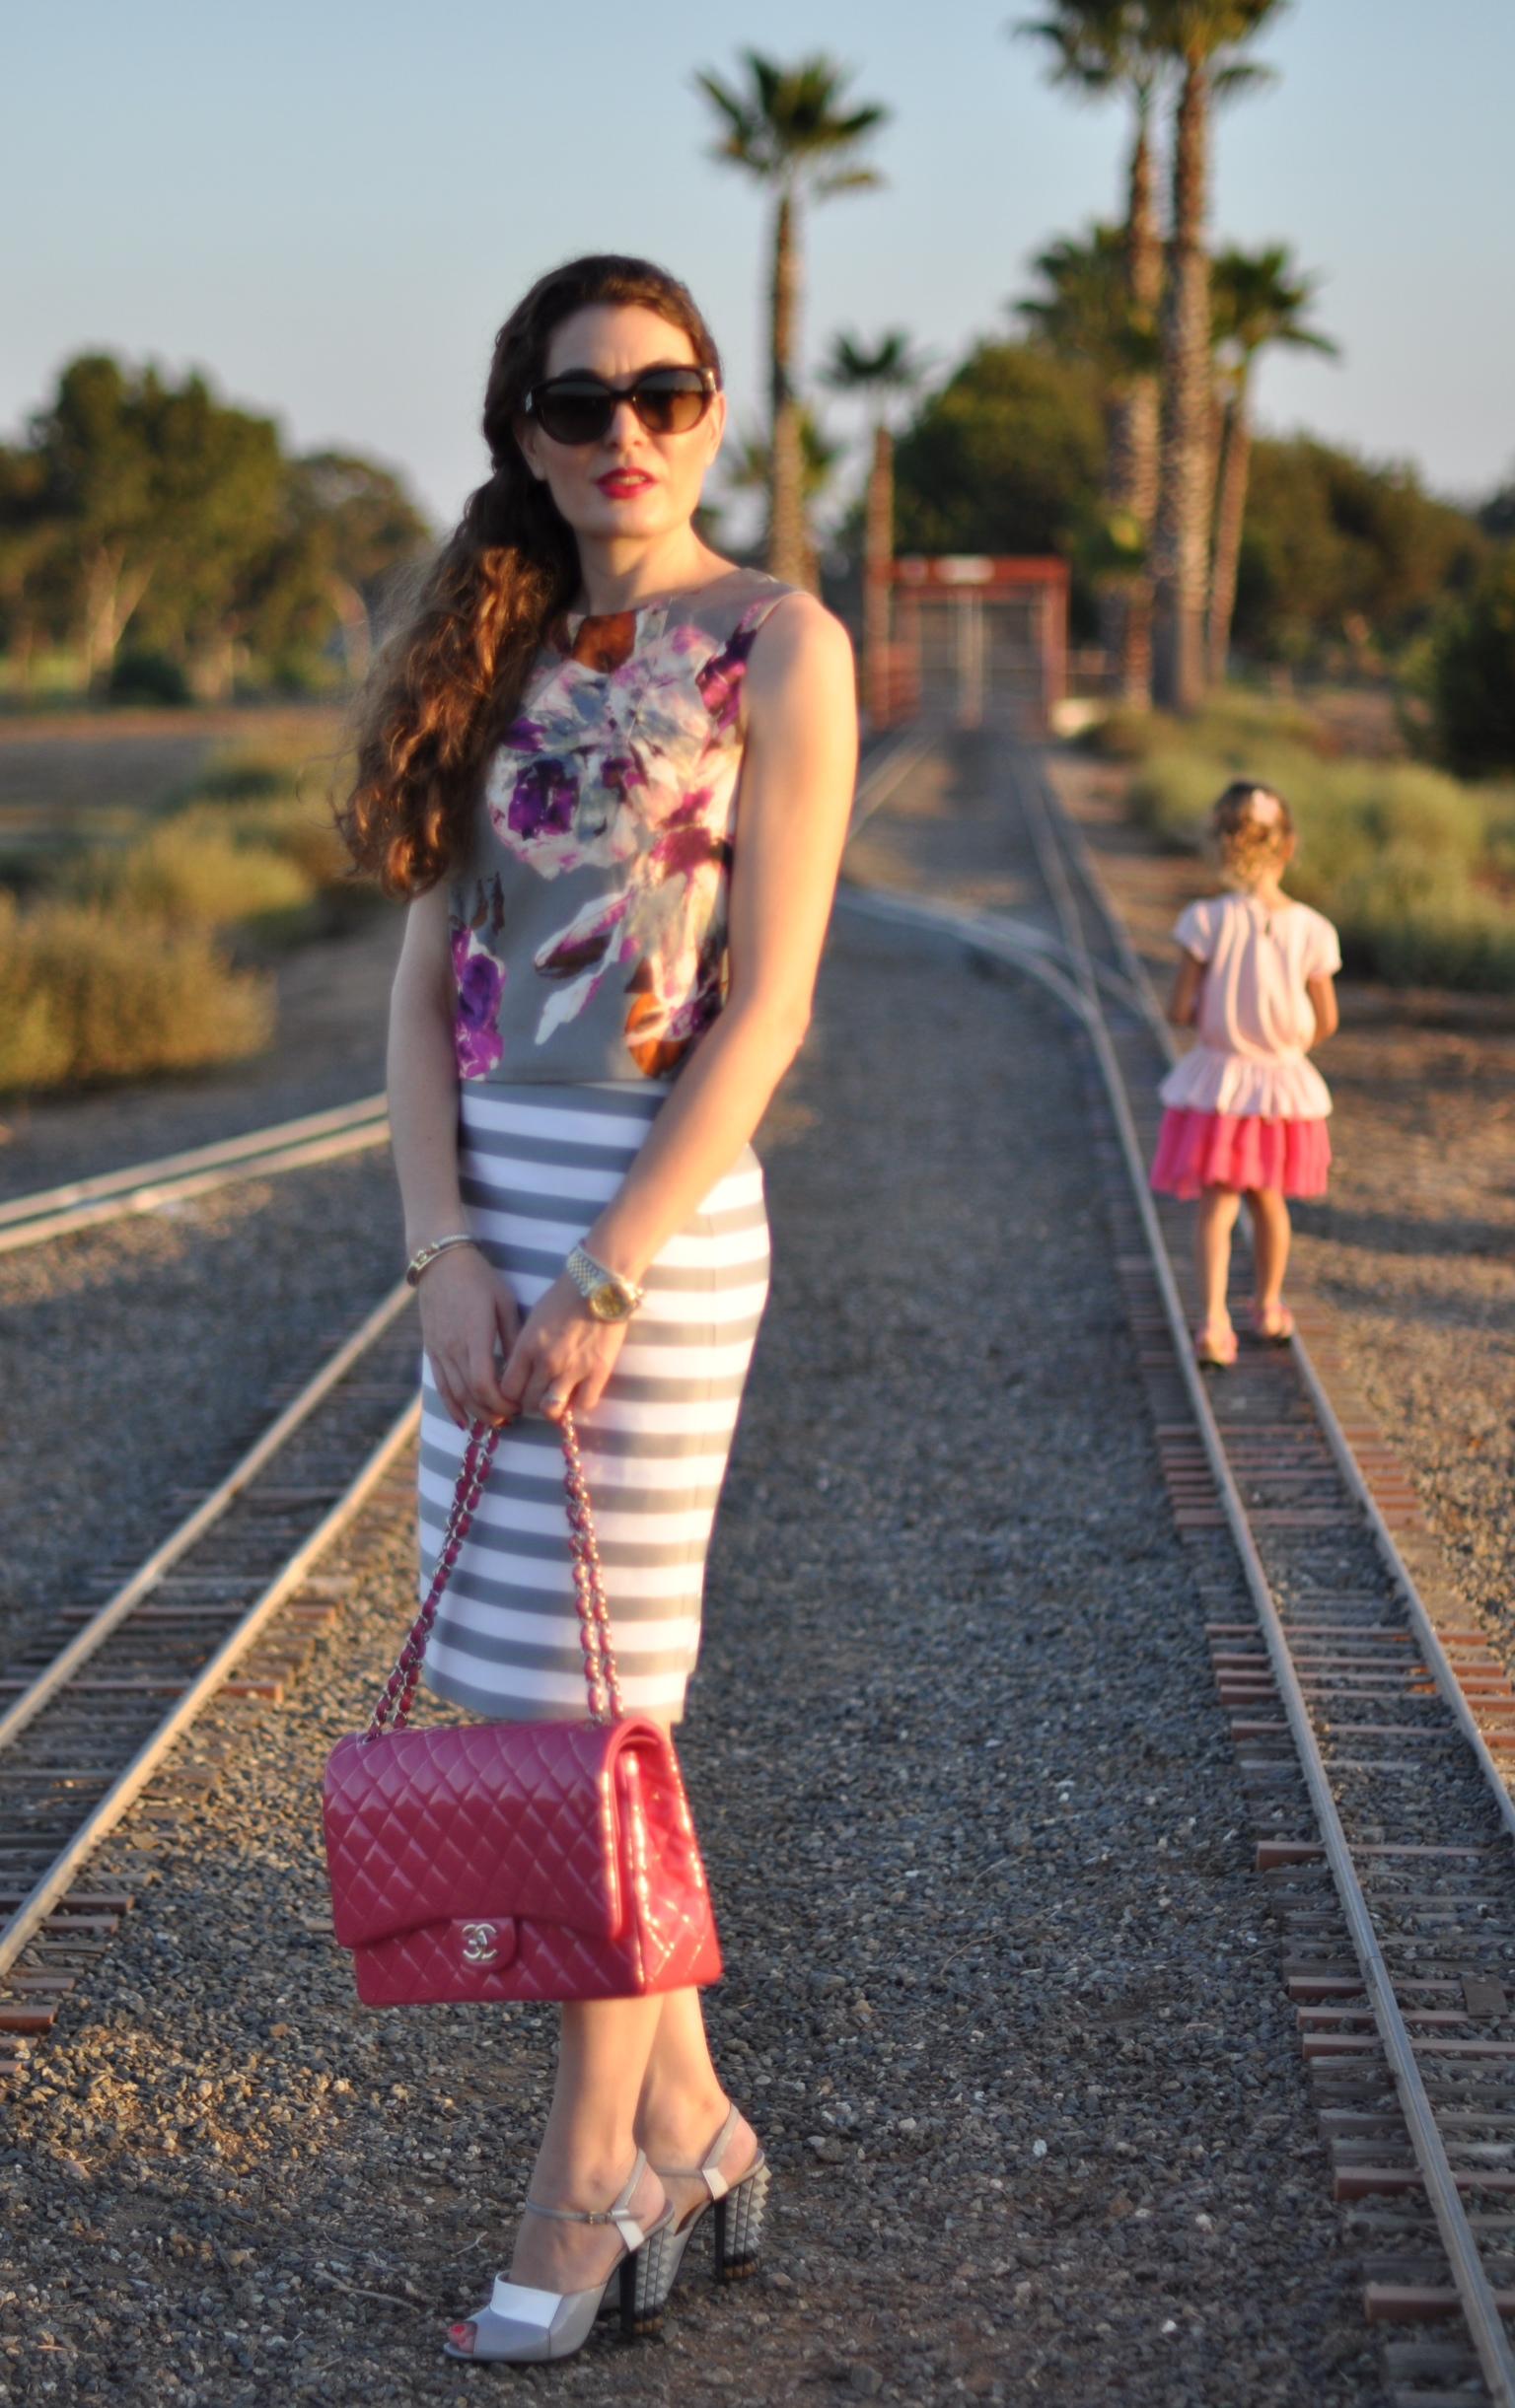 Trina Turk top, Kate spade Skirt, Dior Sunglasses, Fendi shoes, Chanel handbag, Fashion blog